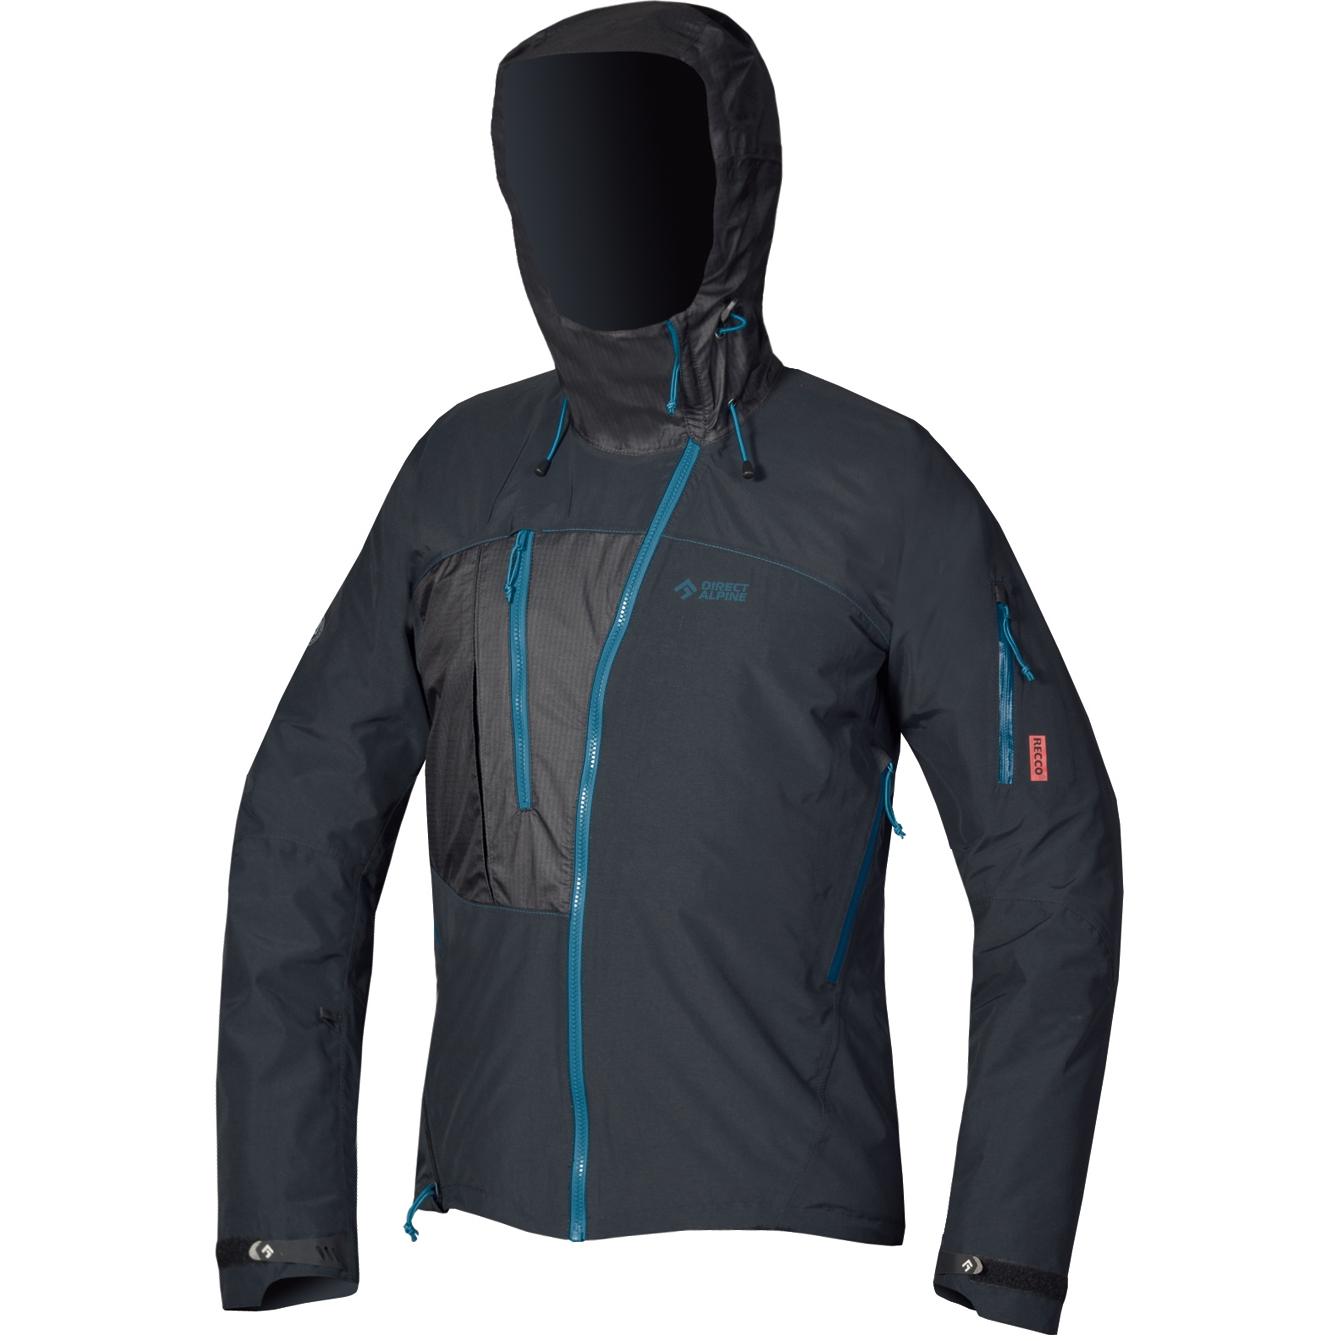 Image of Directalpine Devil Alpine Jacket - anthracite/petrol